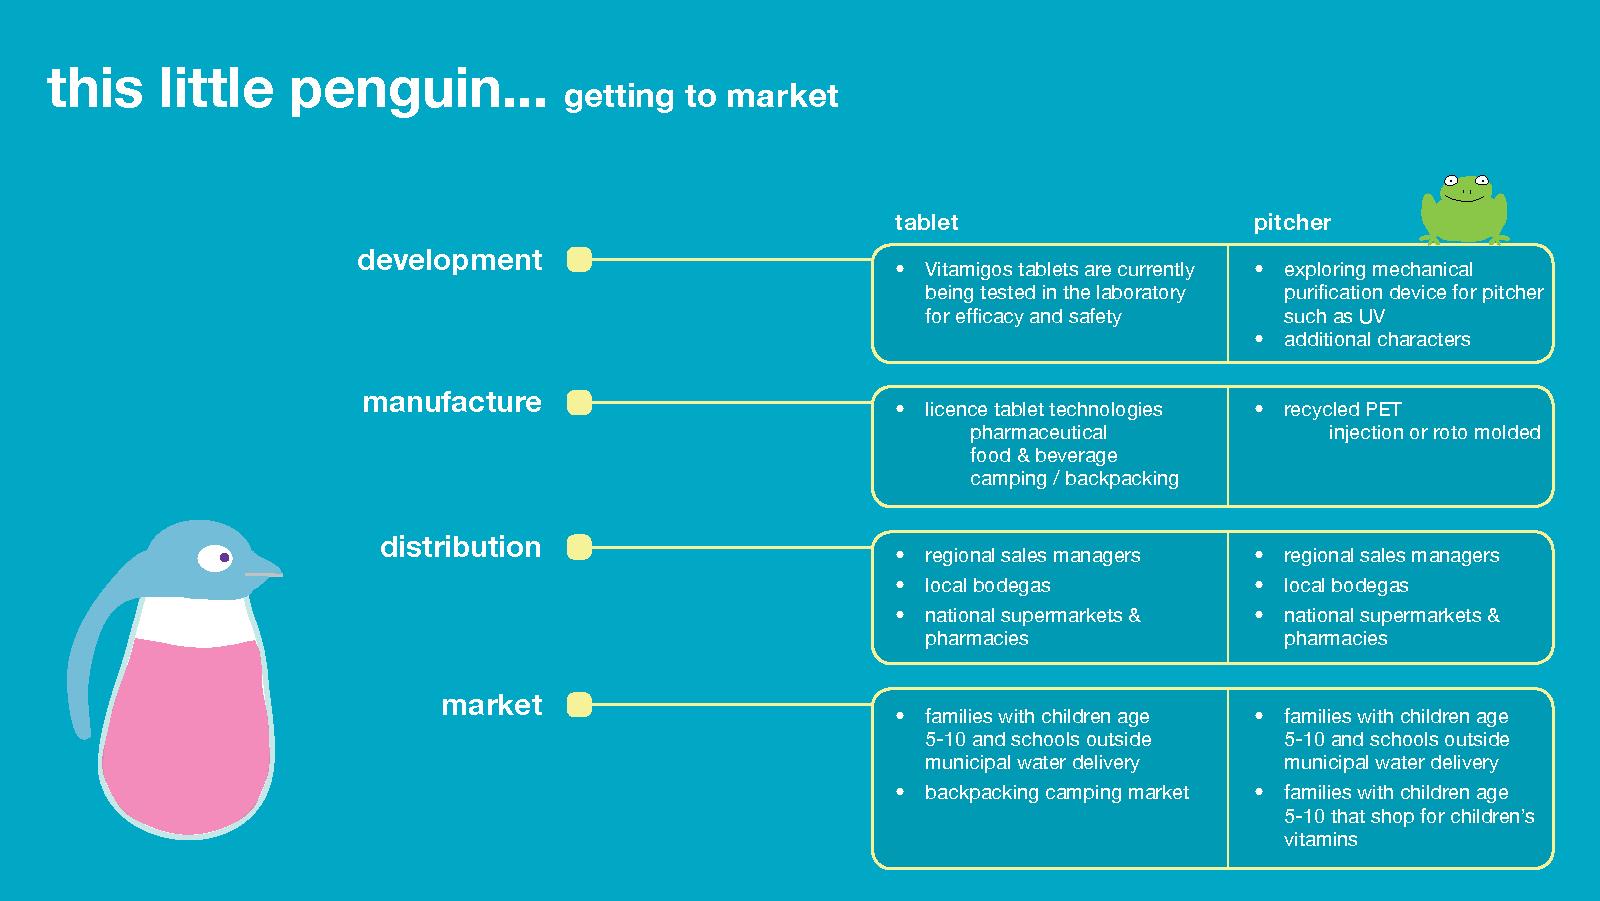 vitamigos_web_market_chart.jpg